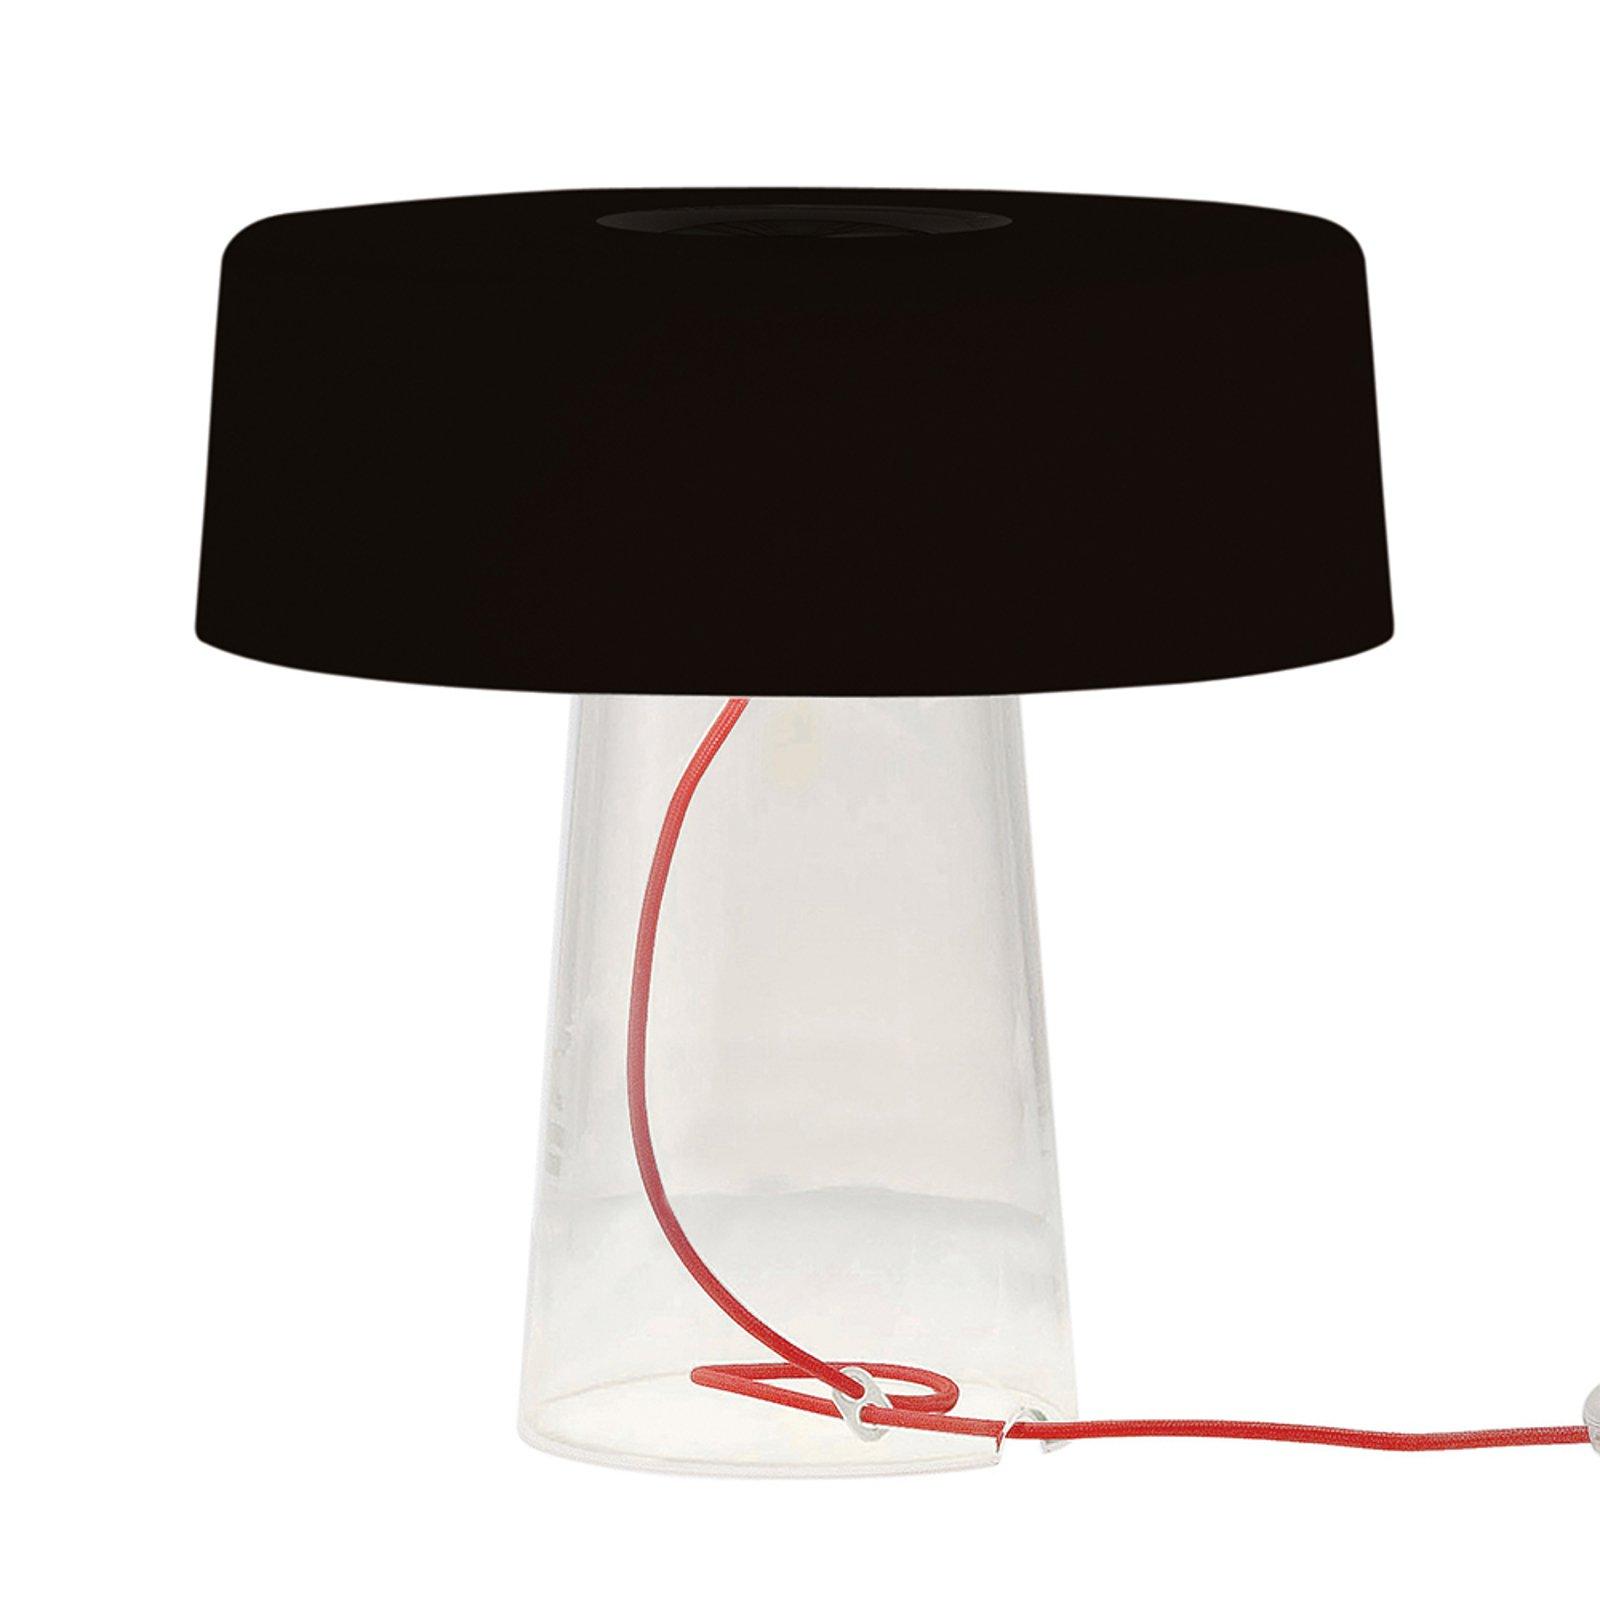 Prandina Glam bordlampe 36 cm klar / skjerm svart